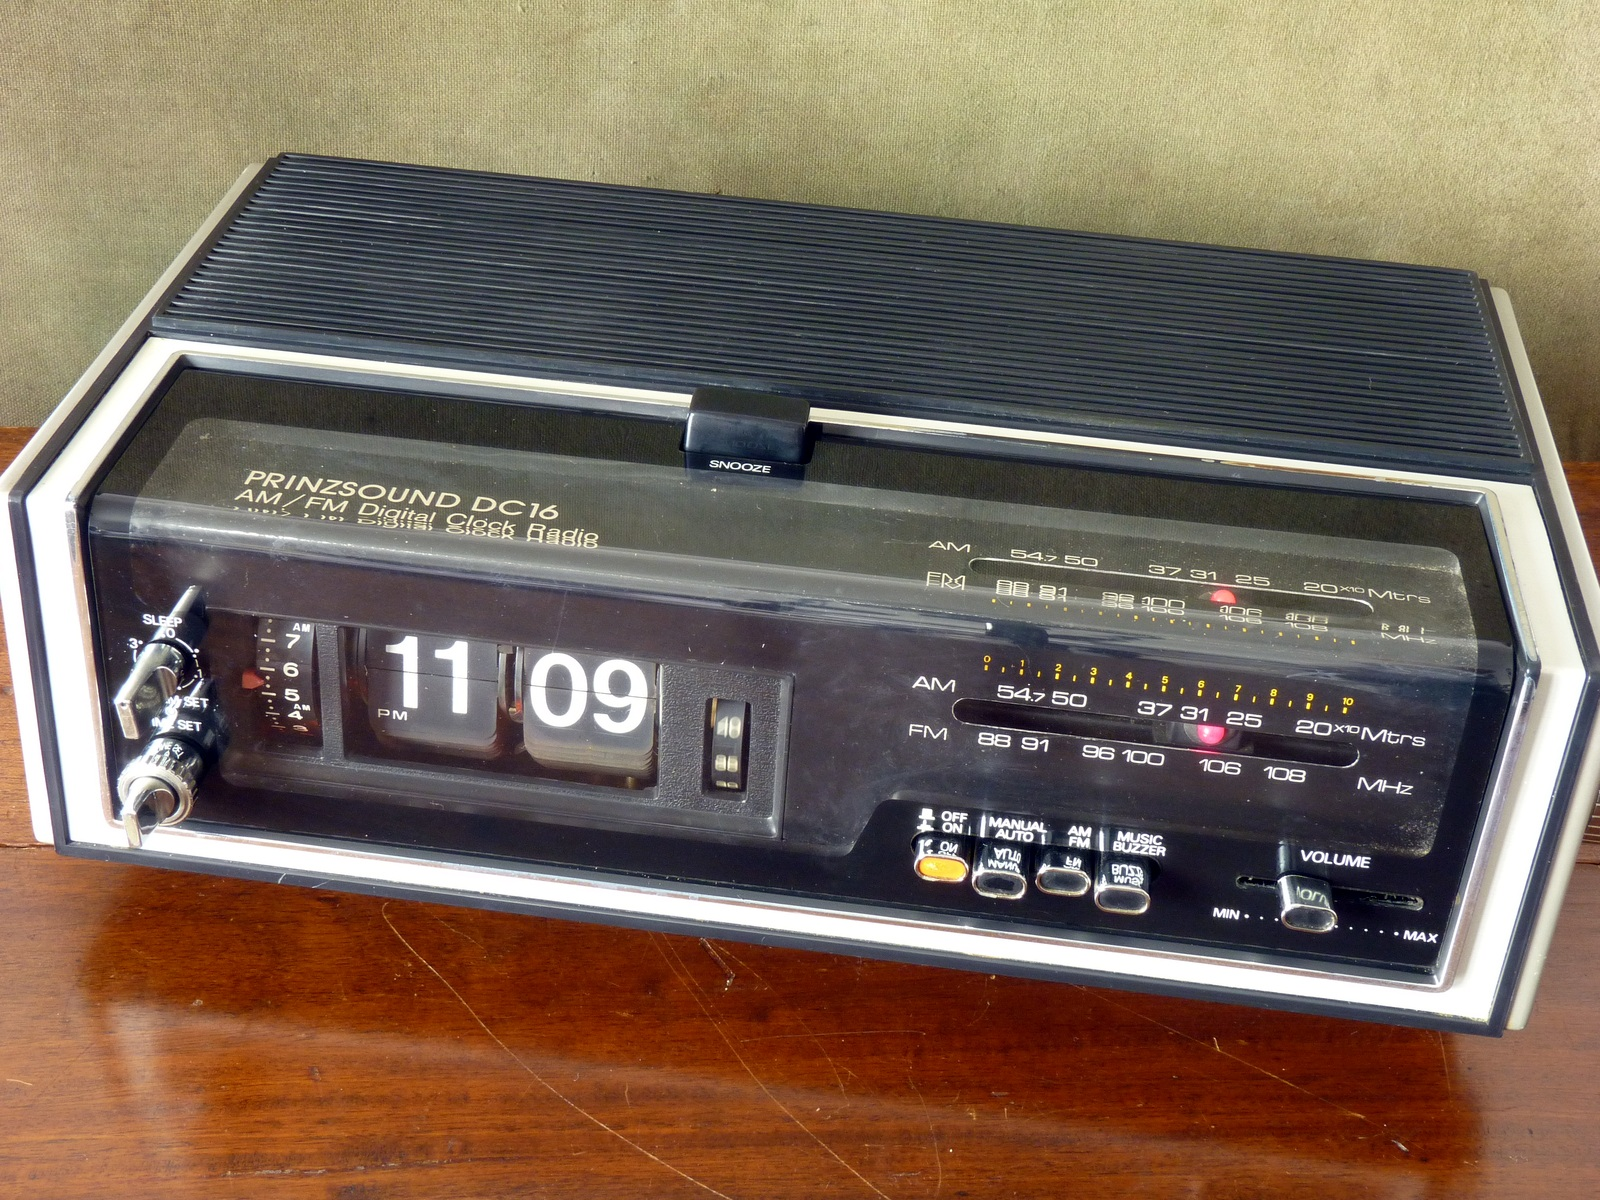 Prinzsound DC16 Flip Clock with AM/FM Radio and Alarm